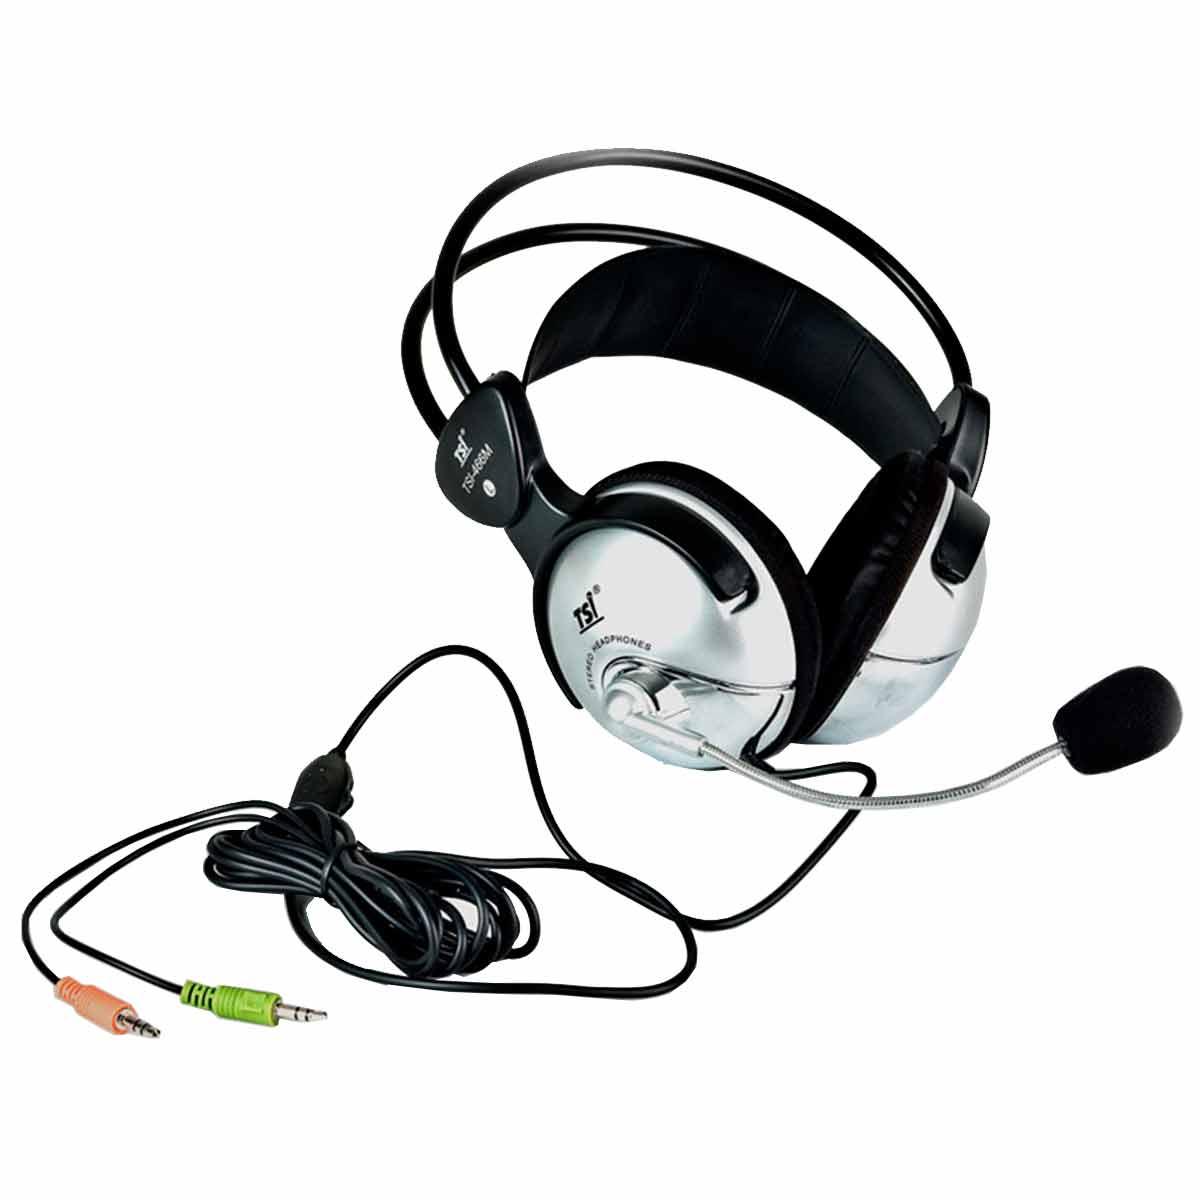 Fone de Ouvido / Headset Over-ear c/ Microfone 466 M - TSI